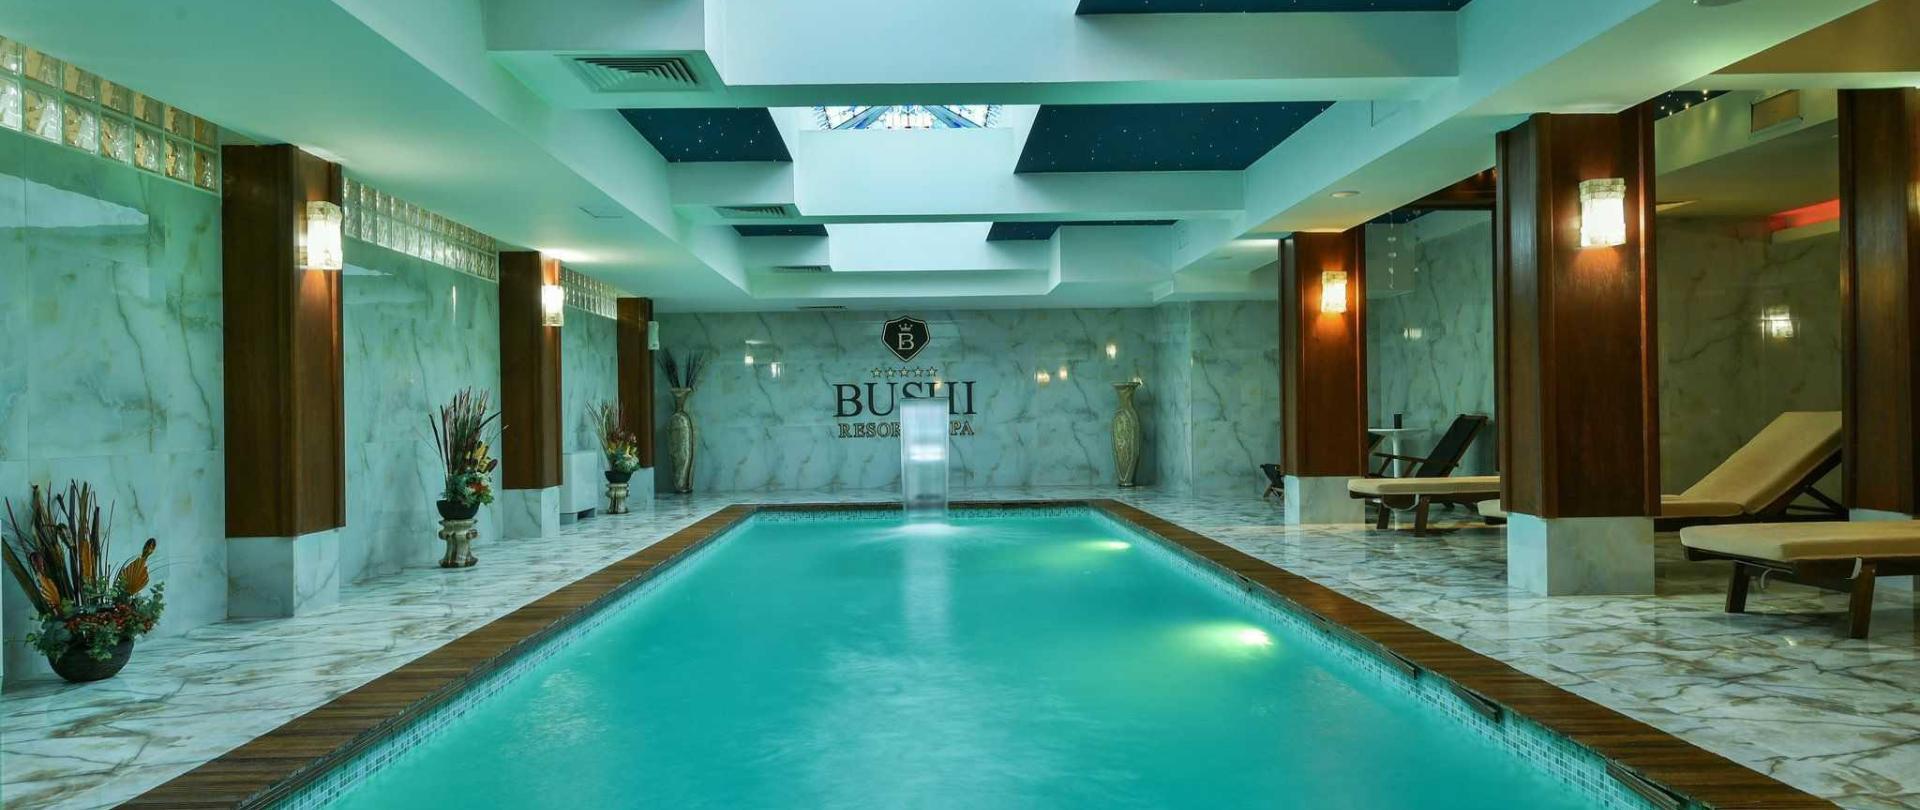 hotel_bushi_053-1-1.jpg